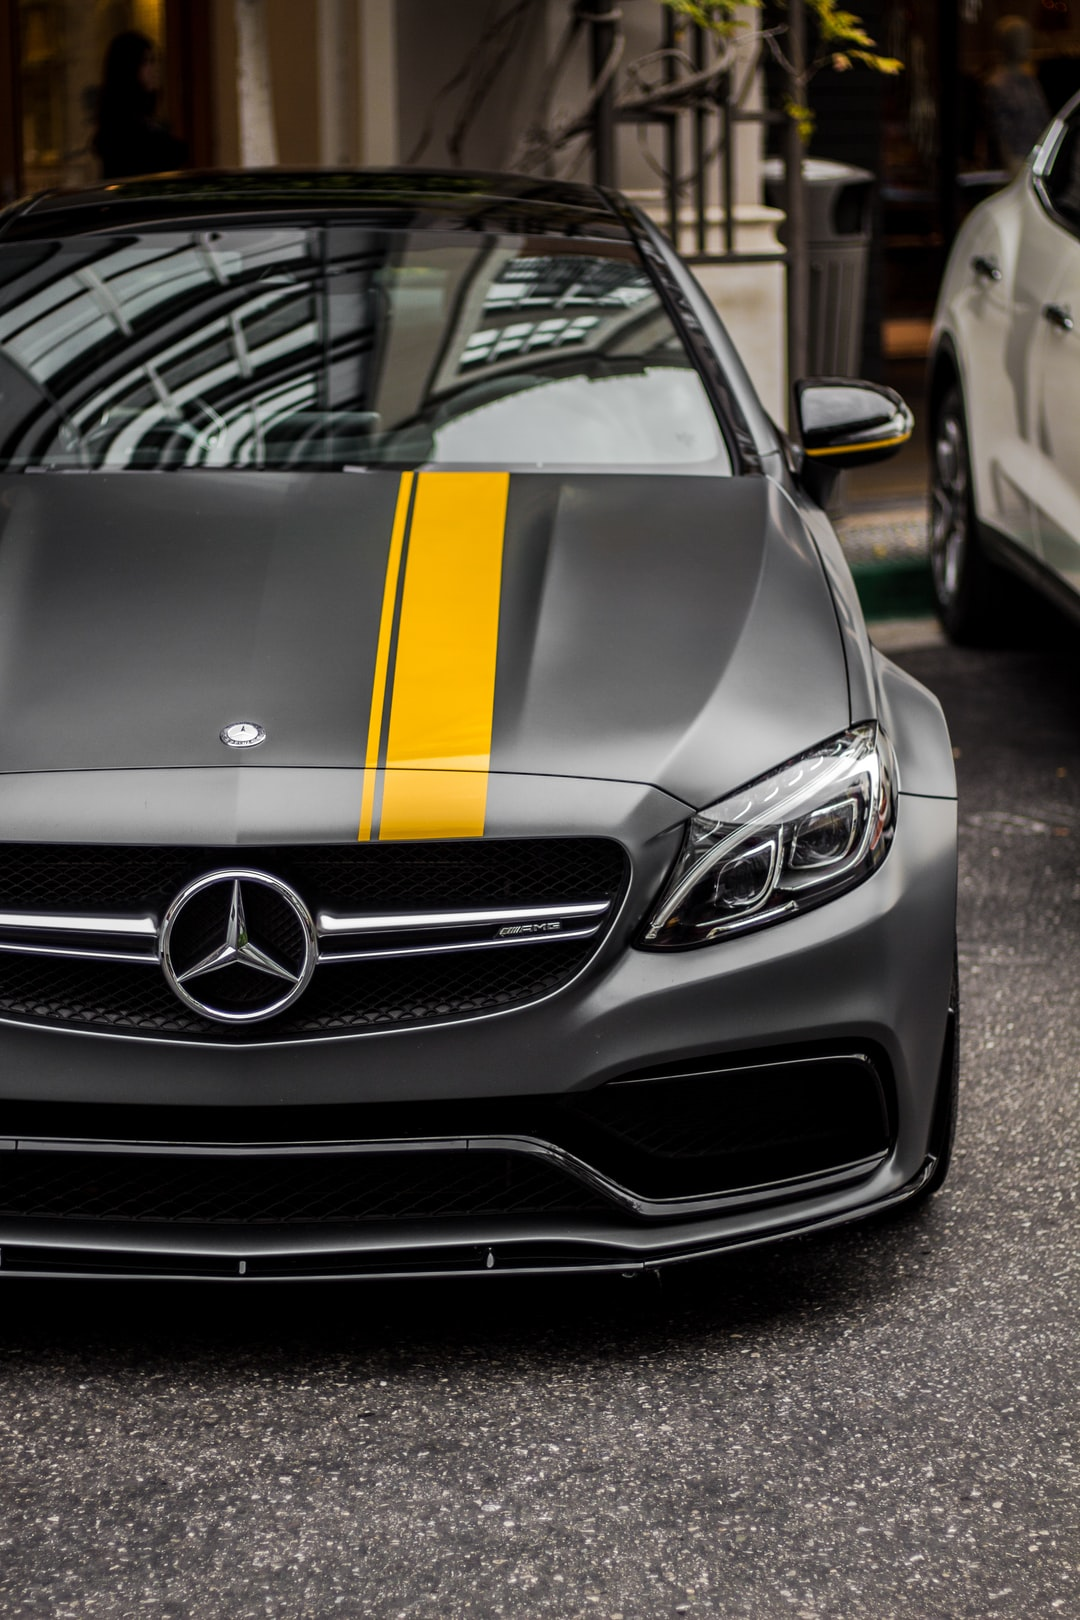 500 Mercedes Pictures Download Free Images On Unsplash